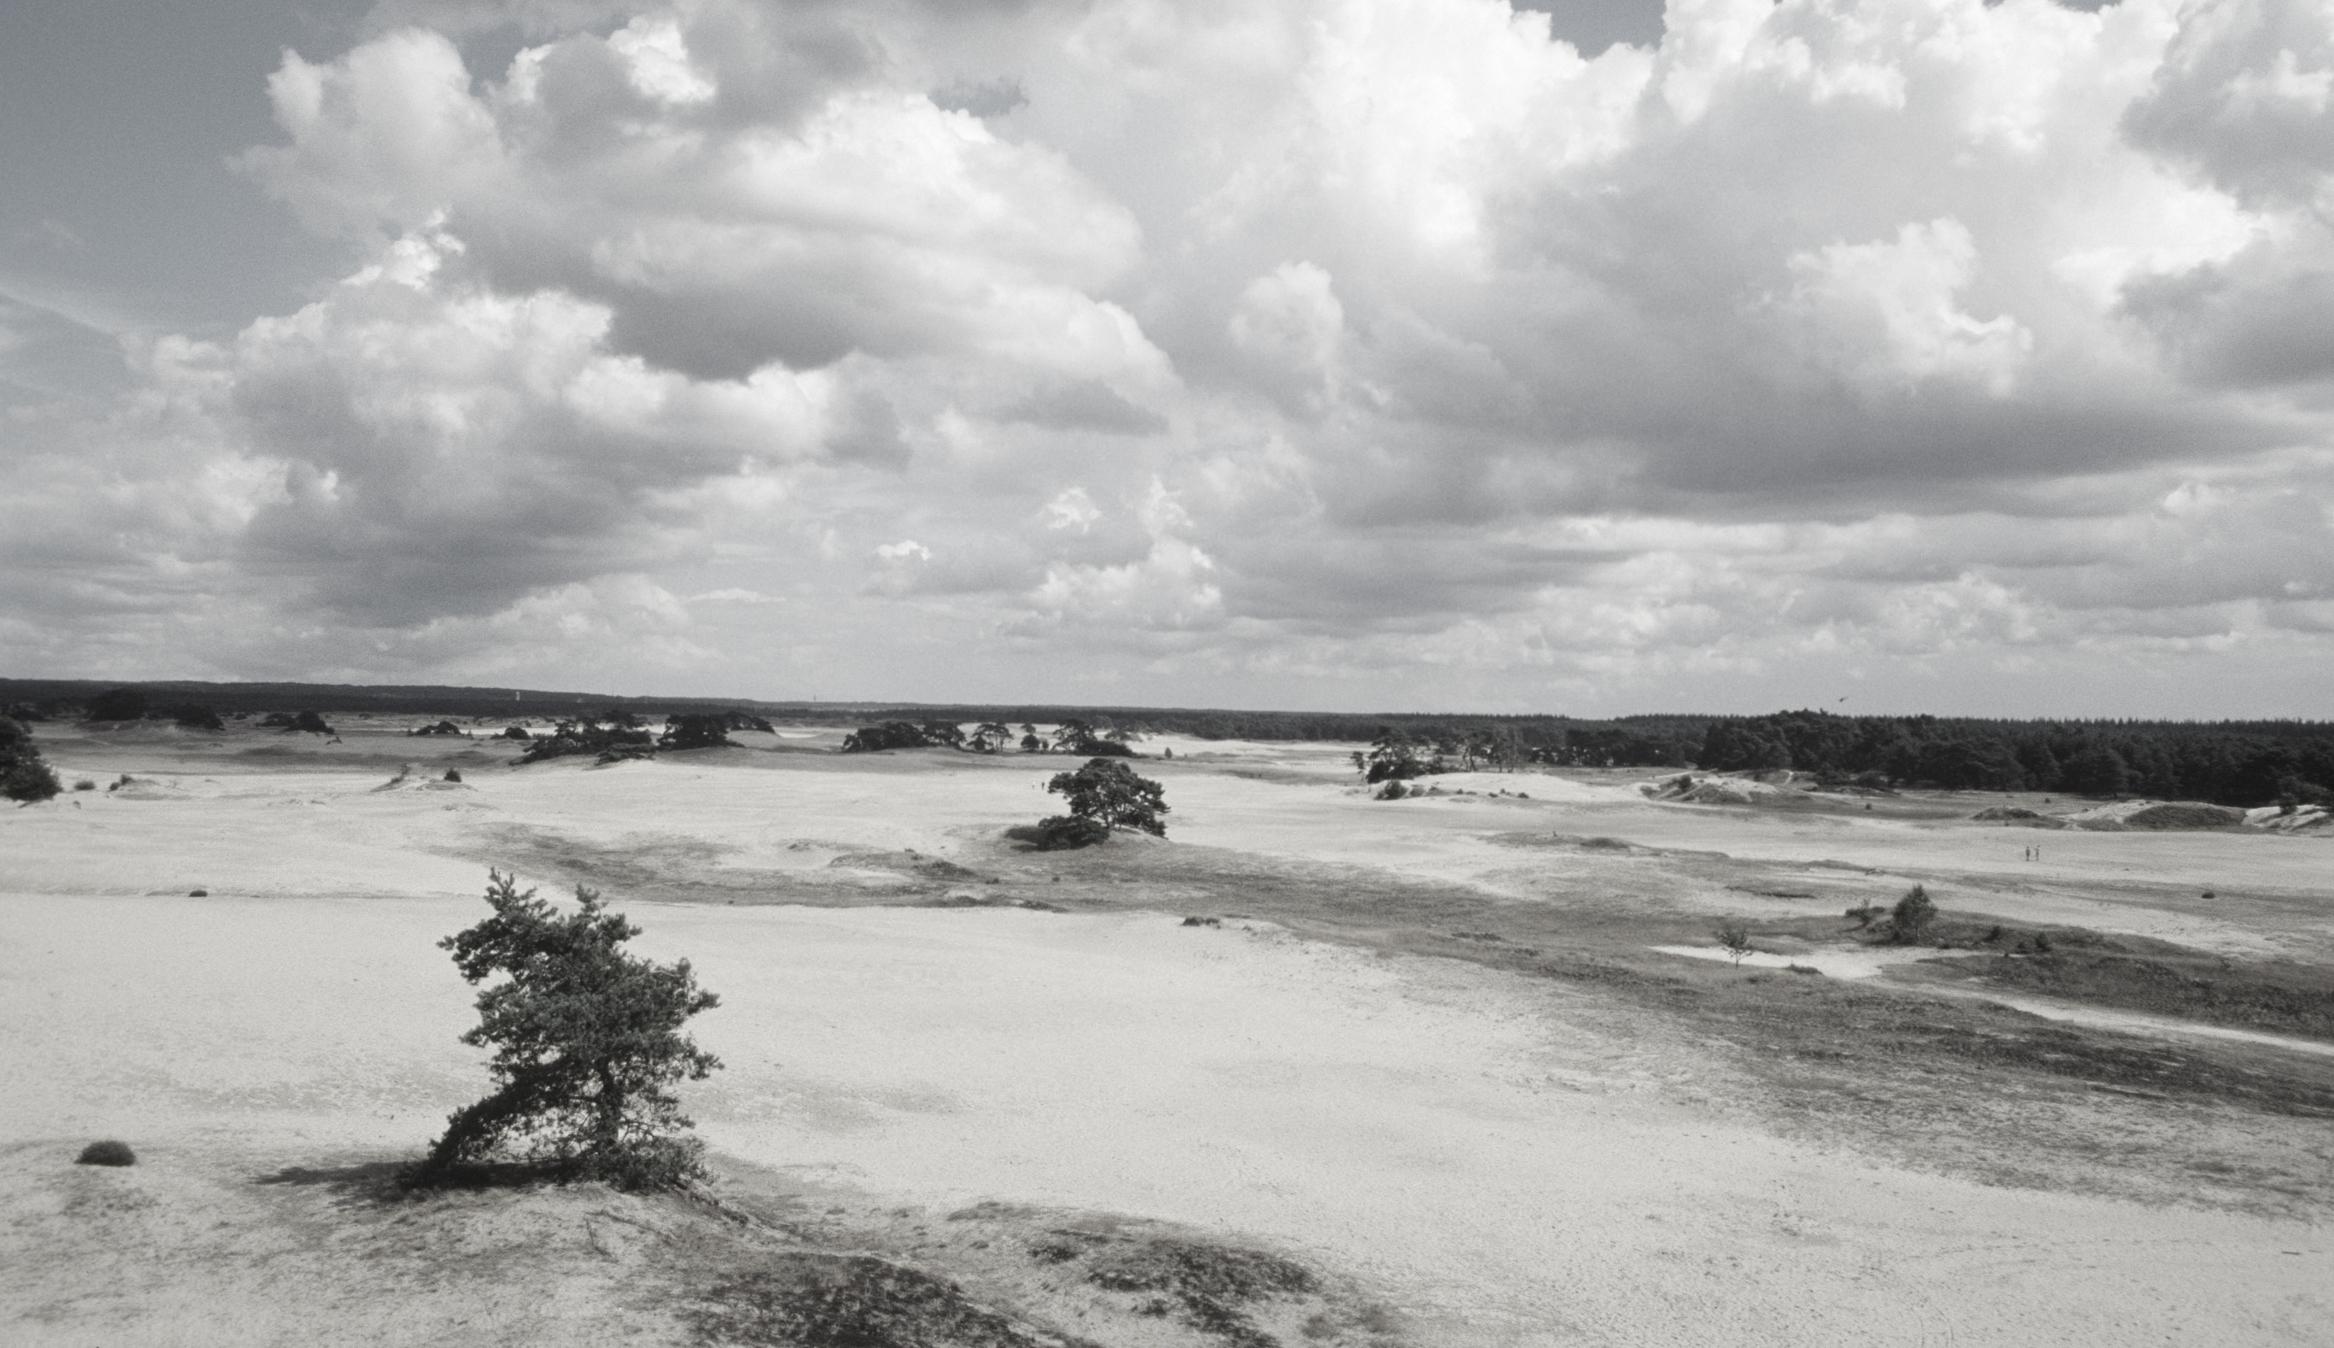 Kootwijkerzand Image0026-1